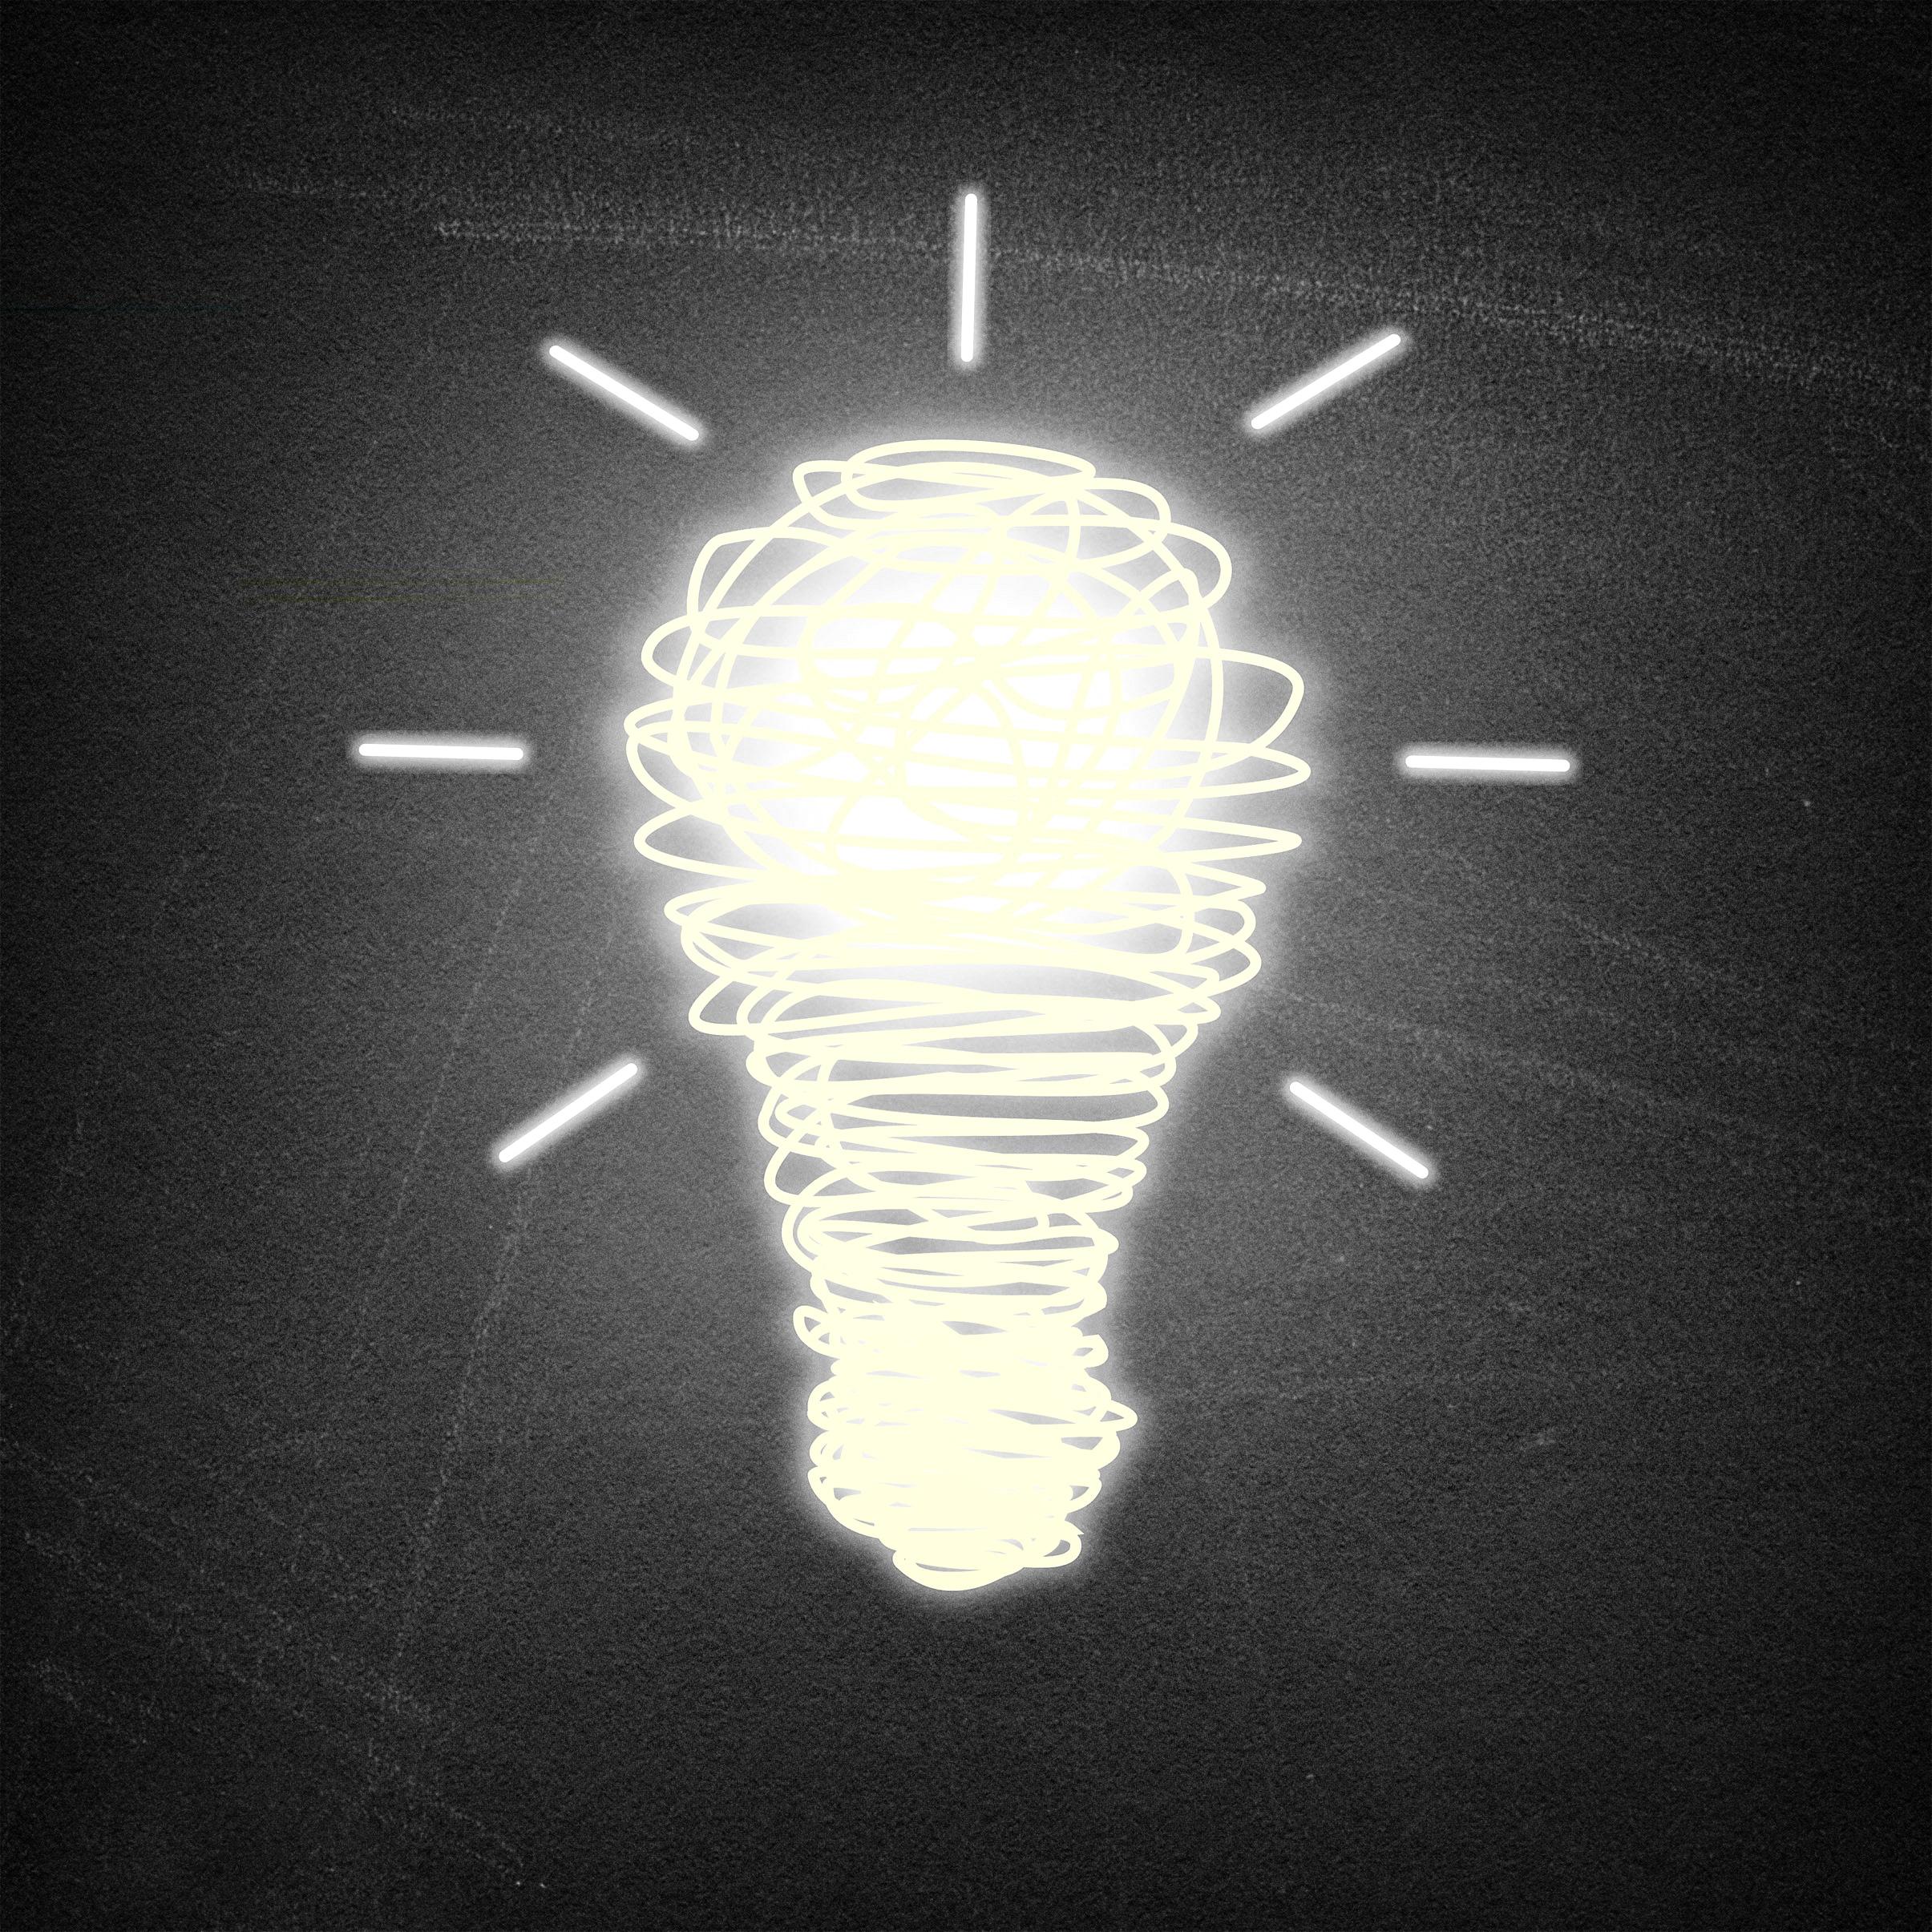 Light Bulb Wallpaper: Free Photo: Lightbulb Idea On Chalkboard Background